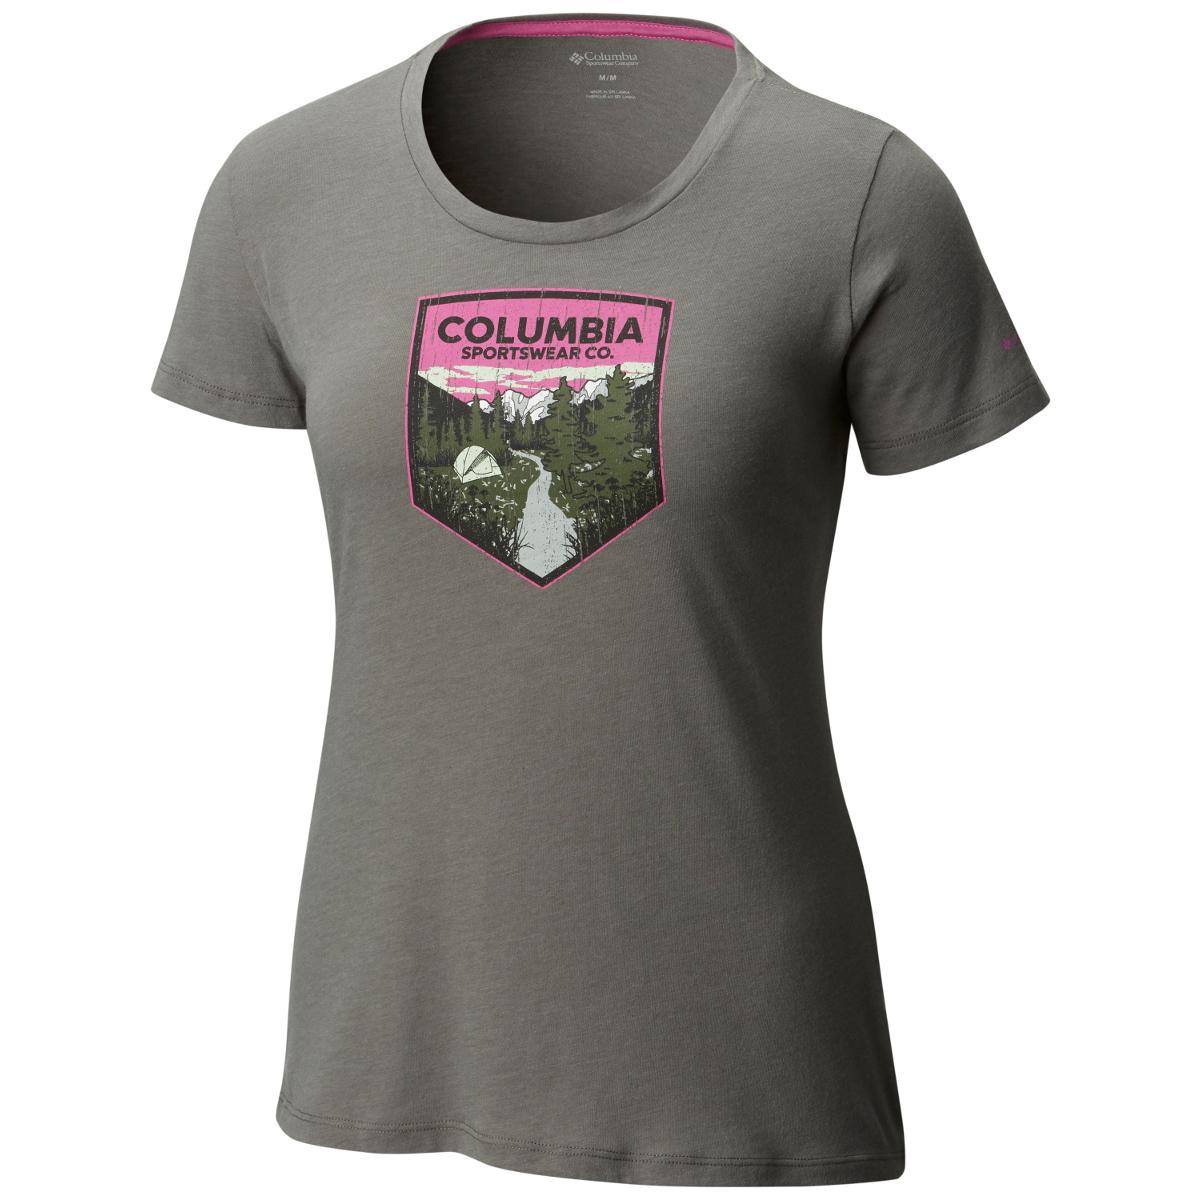 Columbia Women's Columbia Badge Tee - Black, XL